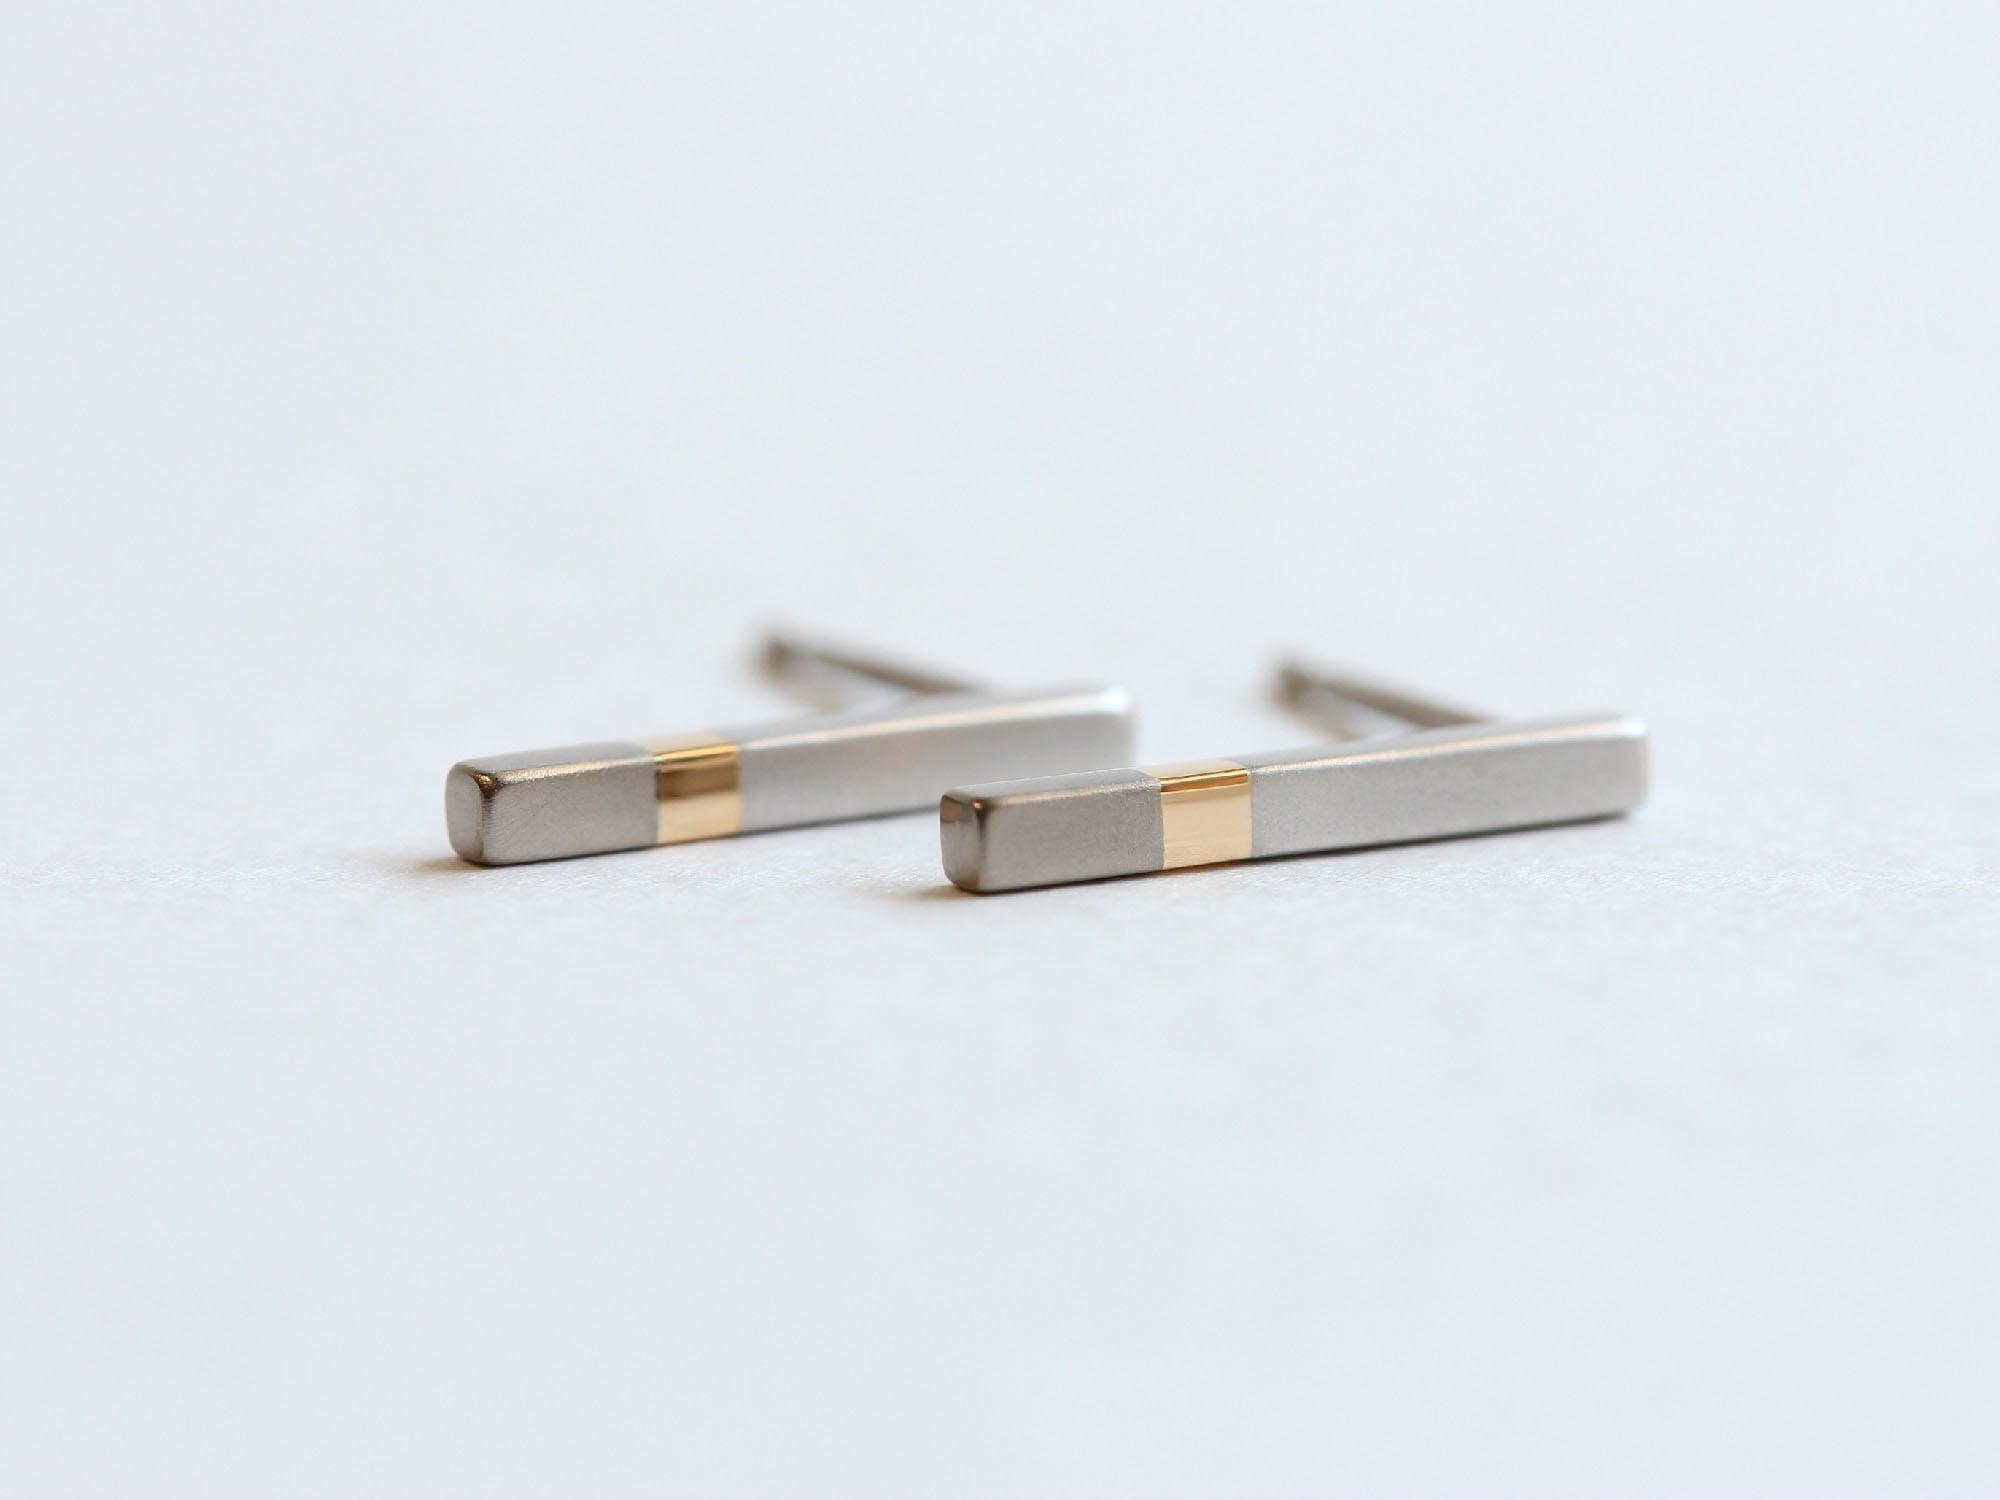 Pt900×K18YG×K18WG/ratio3 stick pierced earrings